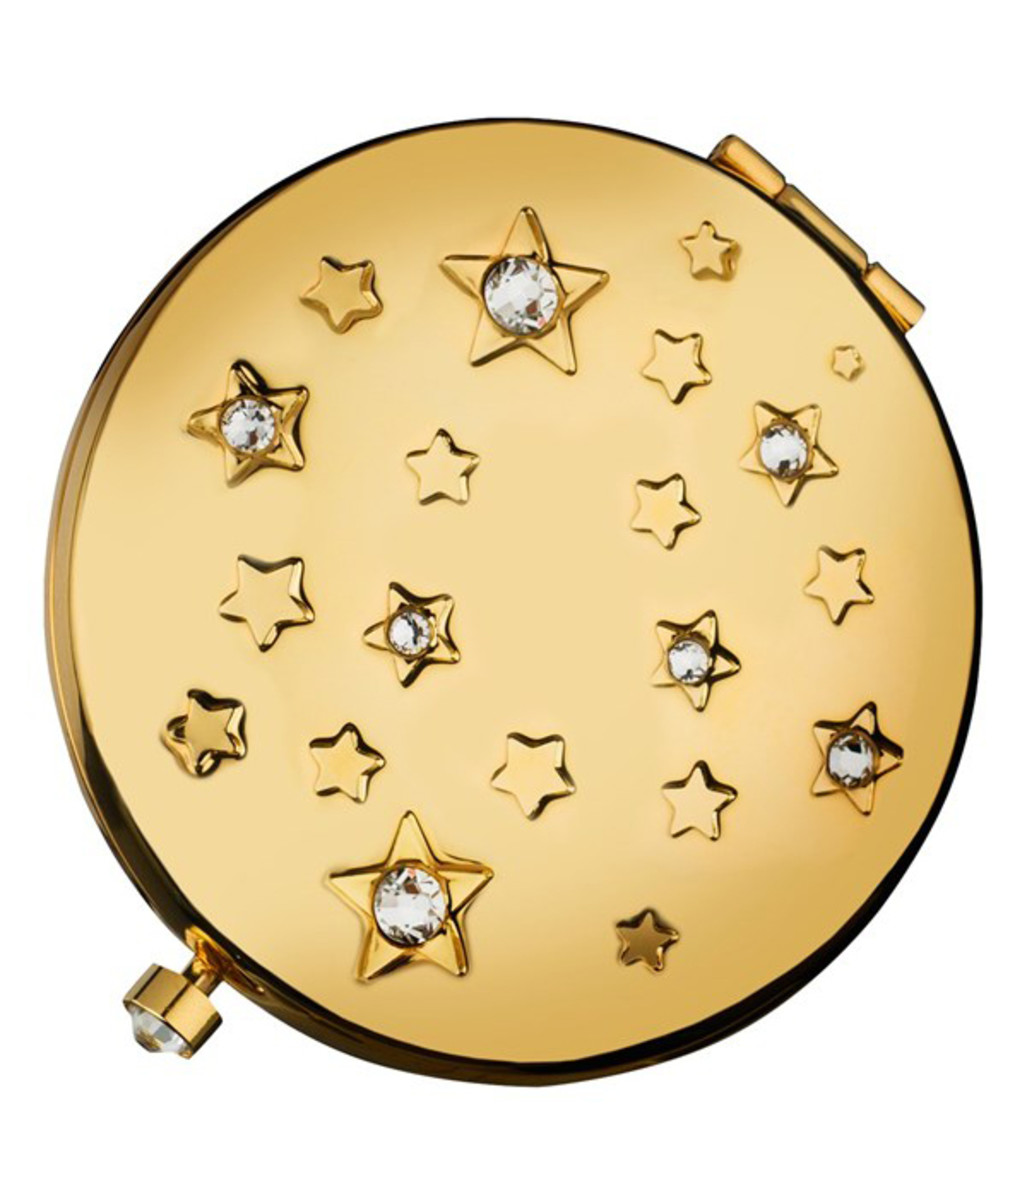 Estee Lauder Glittering Stars Pressed Powder Compact